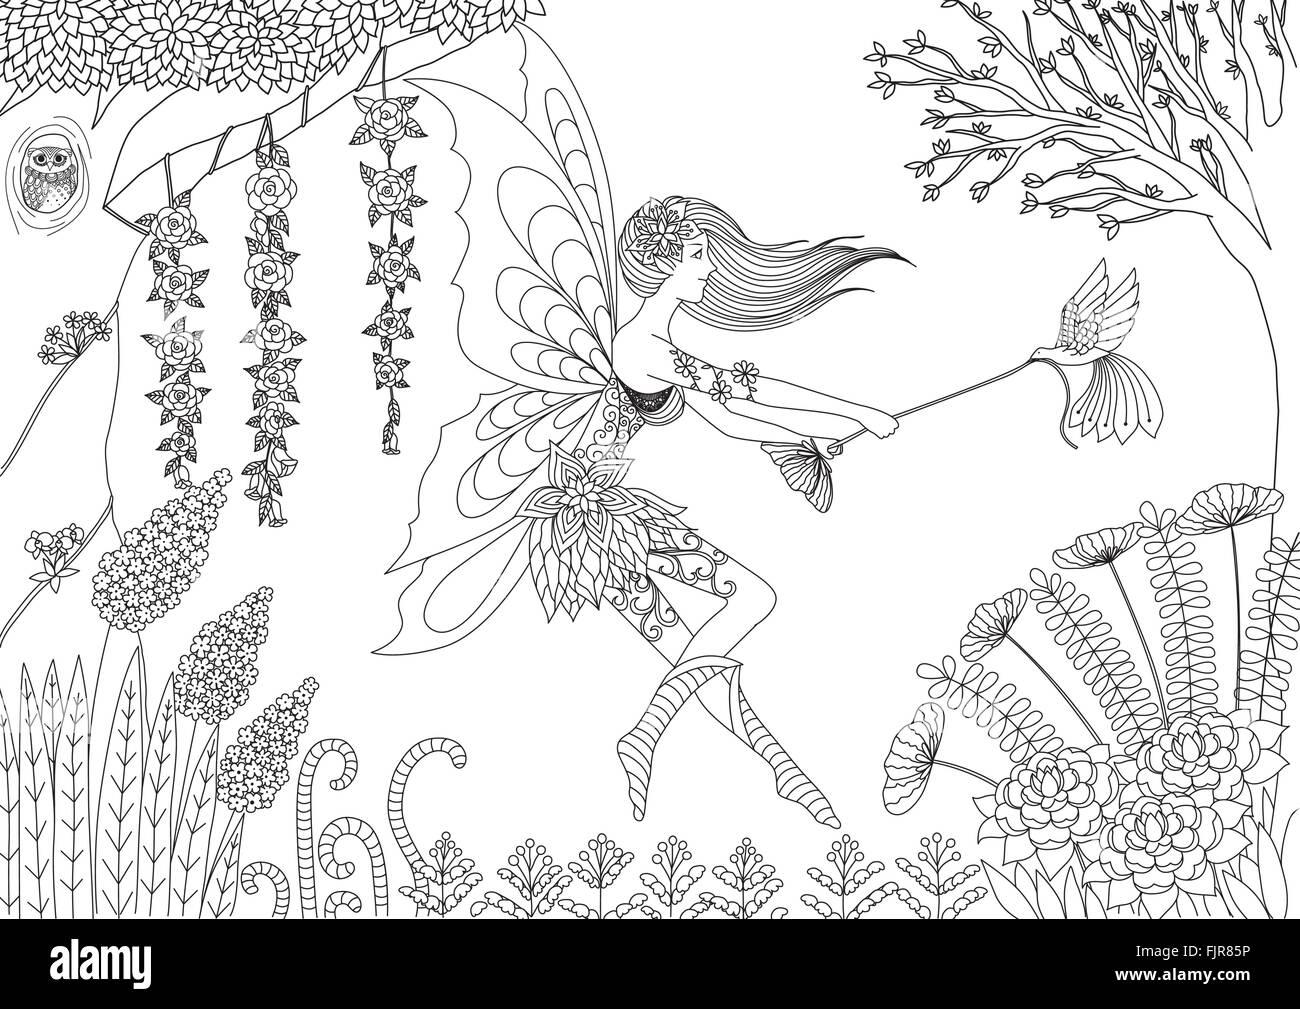 Illustration Beautiful Girl Coloring Book Stockfotos & Illustration ...